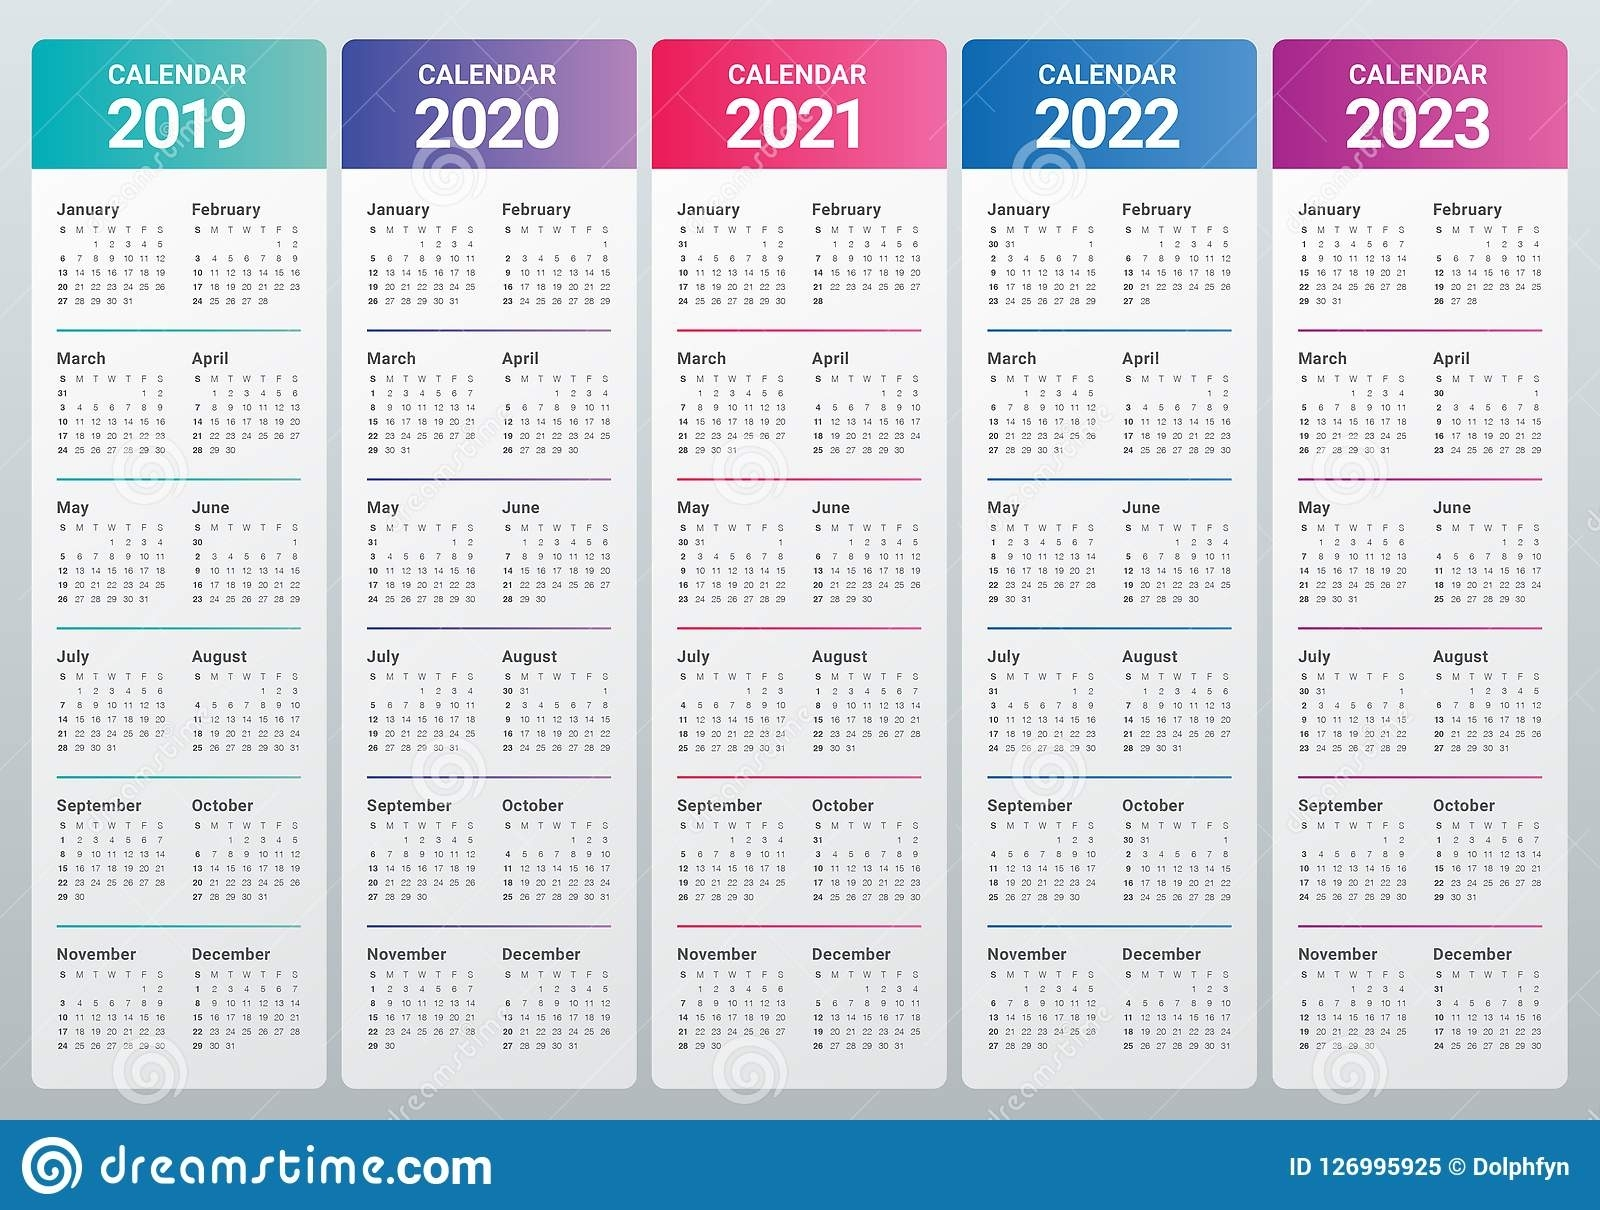 Year 2019 2020 2021 2022 2023 Calendar Vector Design pertaining to Calendar For 2020 To 2023